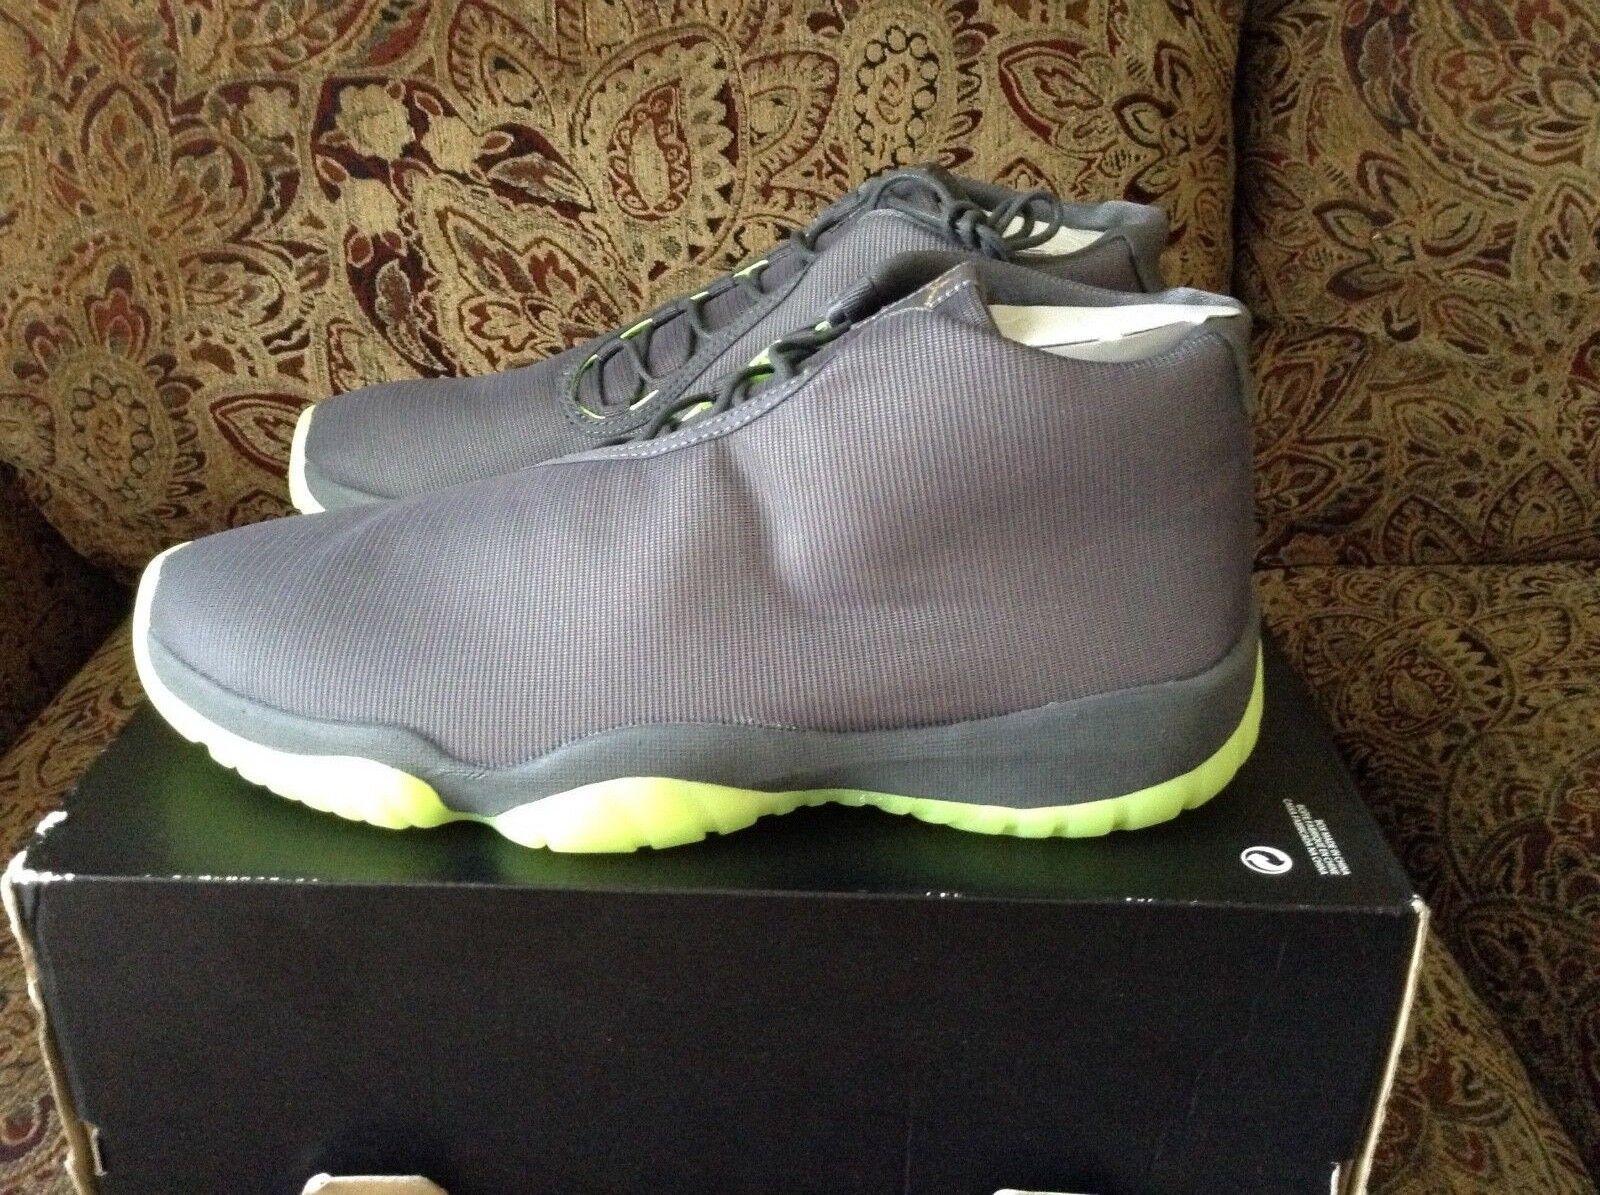 timeless design 91e83 27f1b Nike Air Jordan futuro Gris Gris Gris Volt 3M 656503-025 comodo gran  descuento 30ec5a